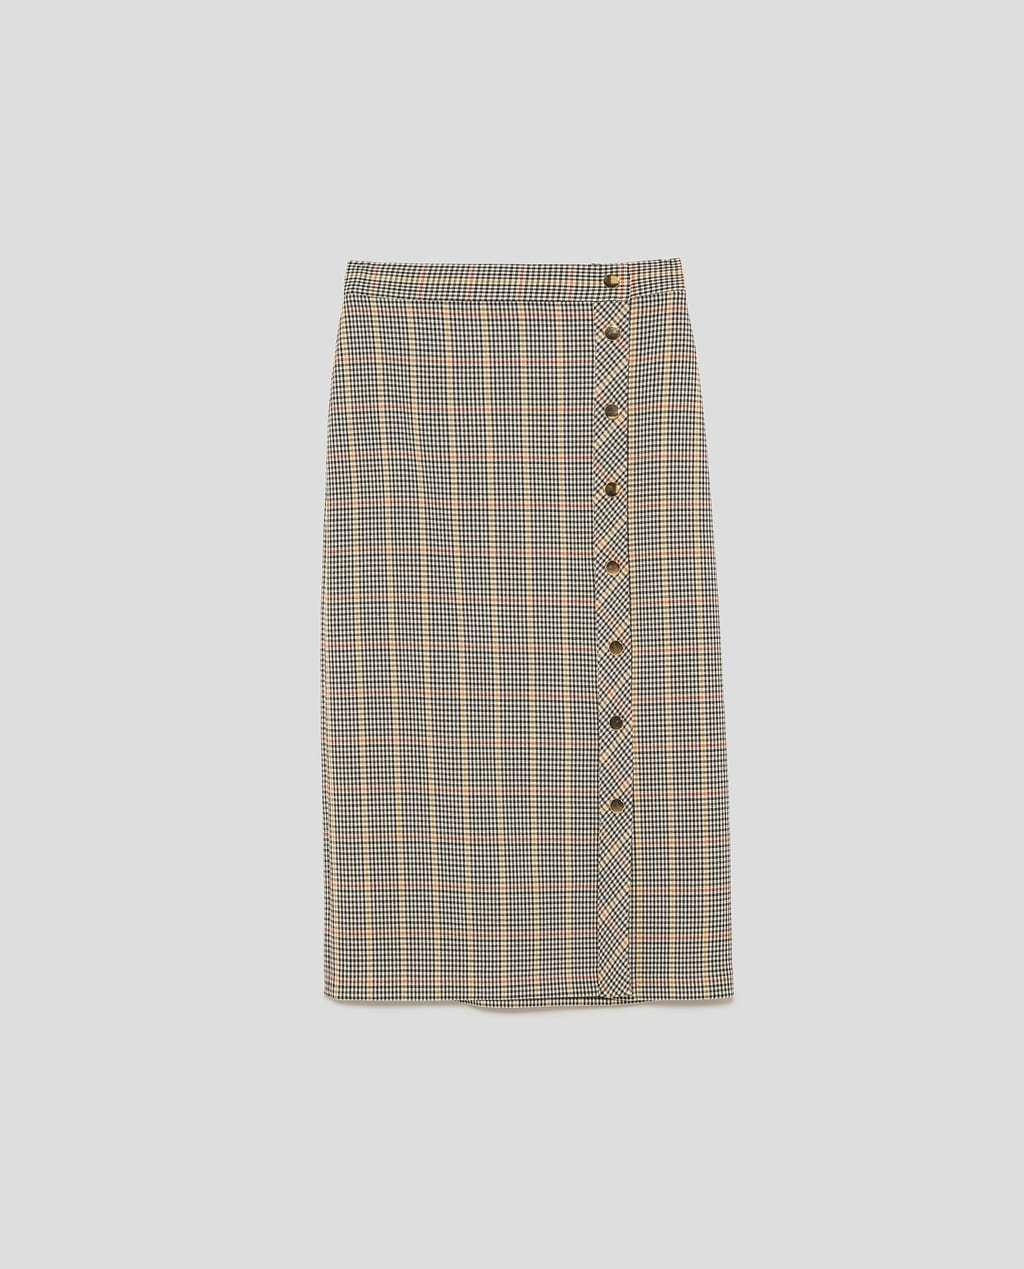 Falda midi con botones, de Zara (19,99 euros).